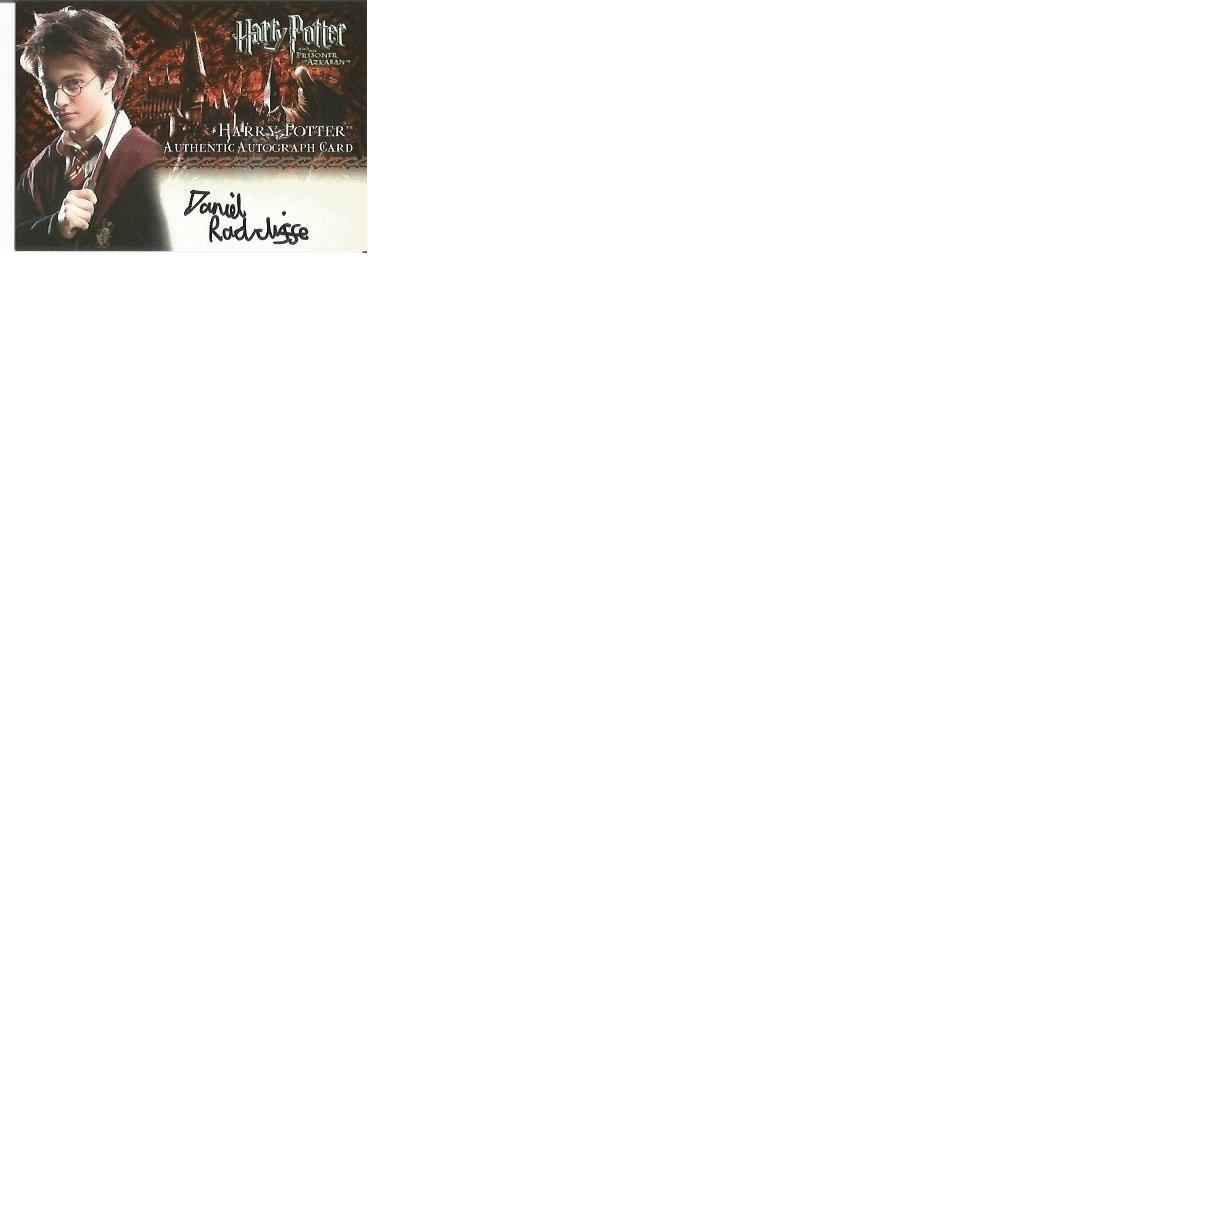 Lot 62 - Daniel Radcliffe and Tom Felton signed Harry Potter Prisoner of Azkaban autographed Artbox trading